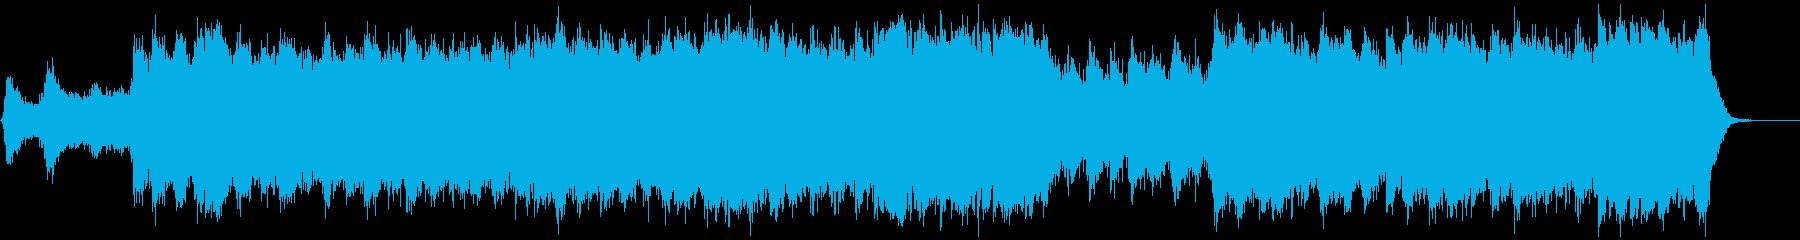 DREAM ISLAND's reproduced waveform